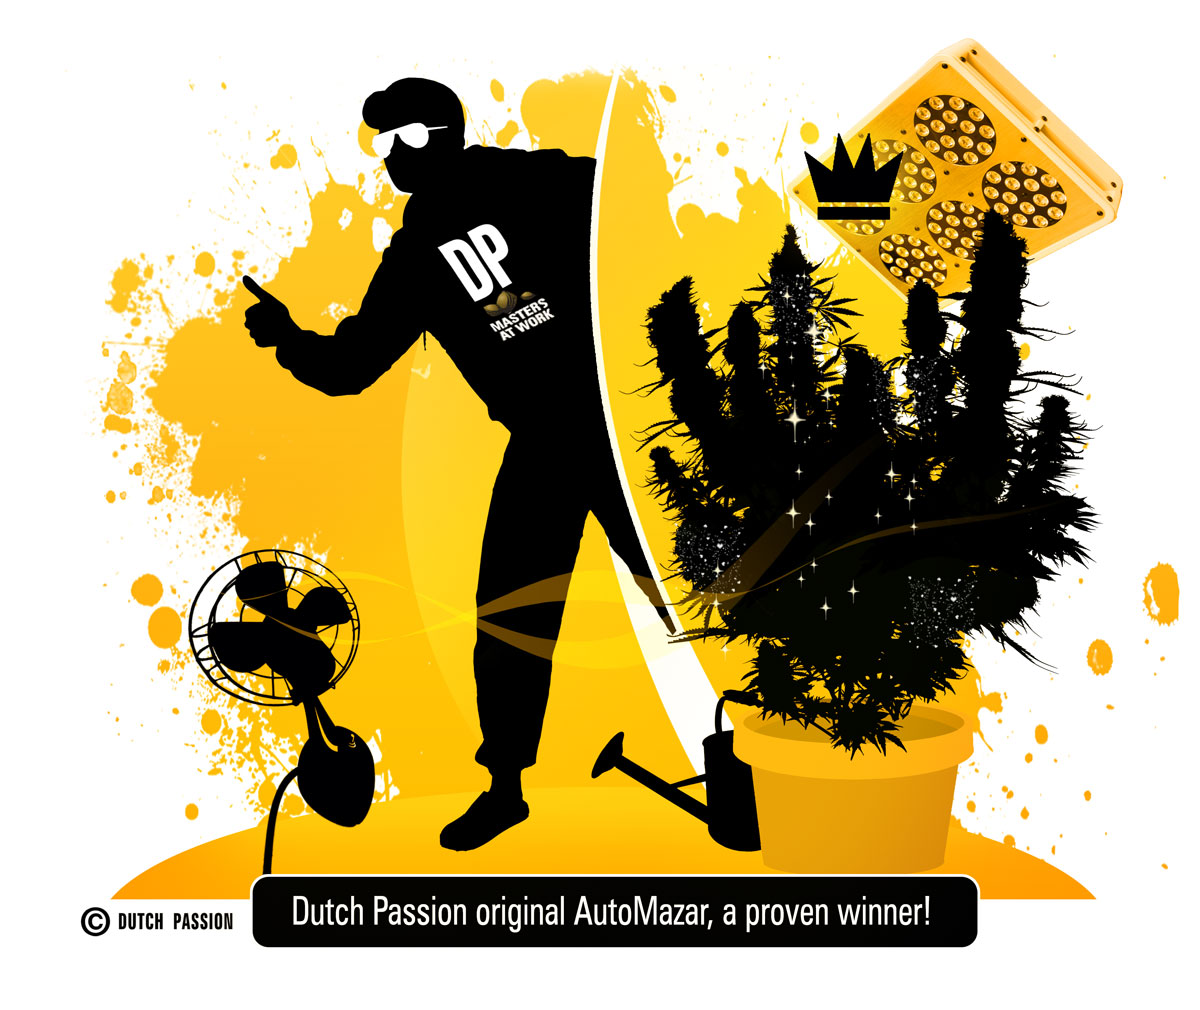 Dutch Passion AutoMazar Grow